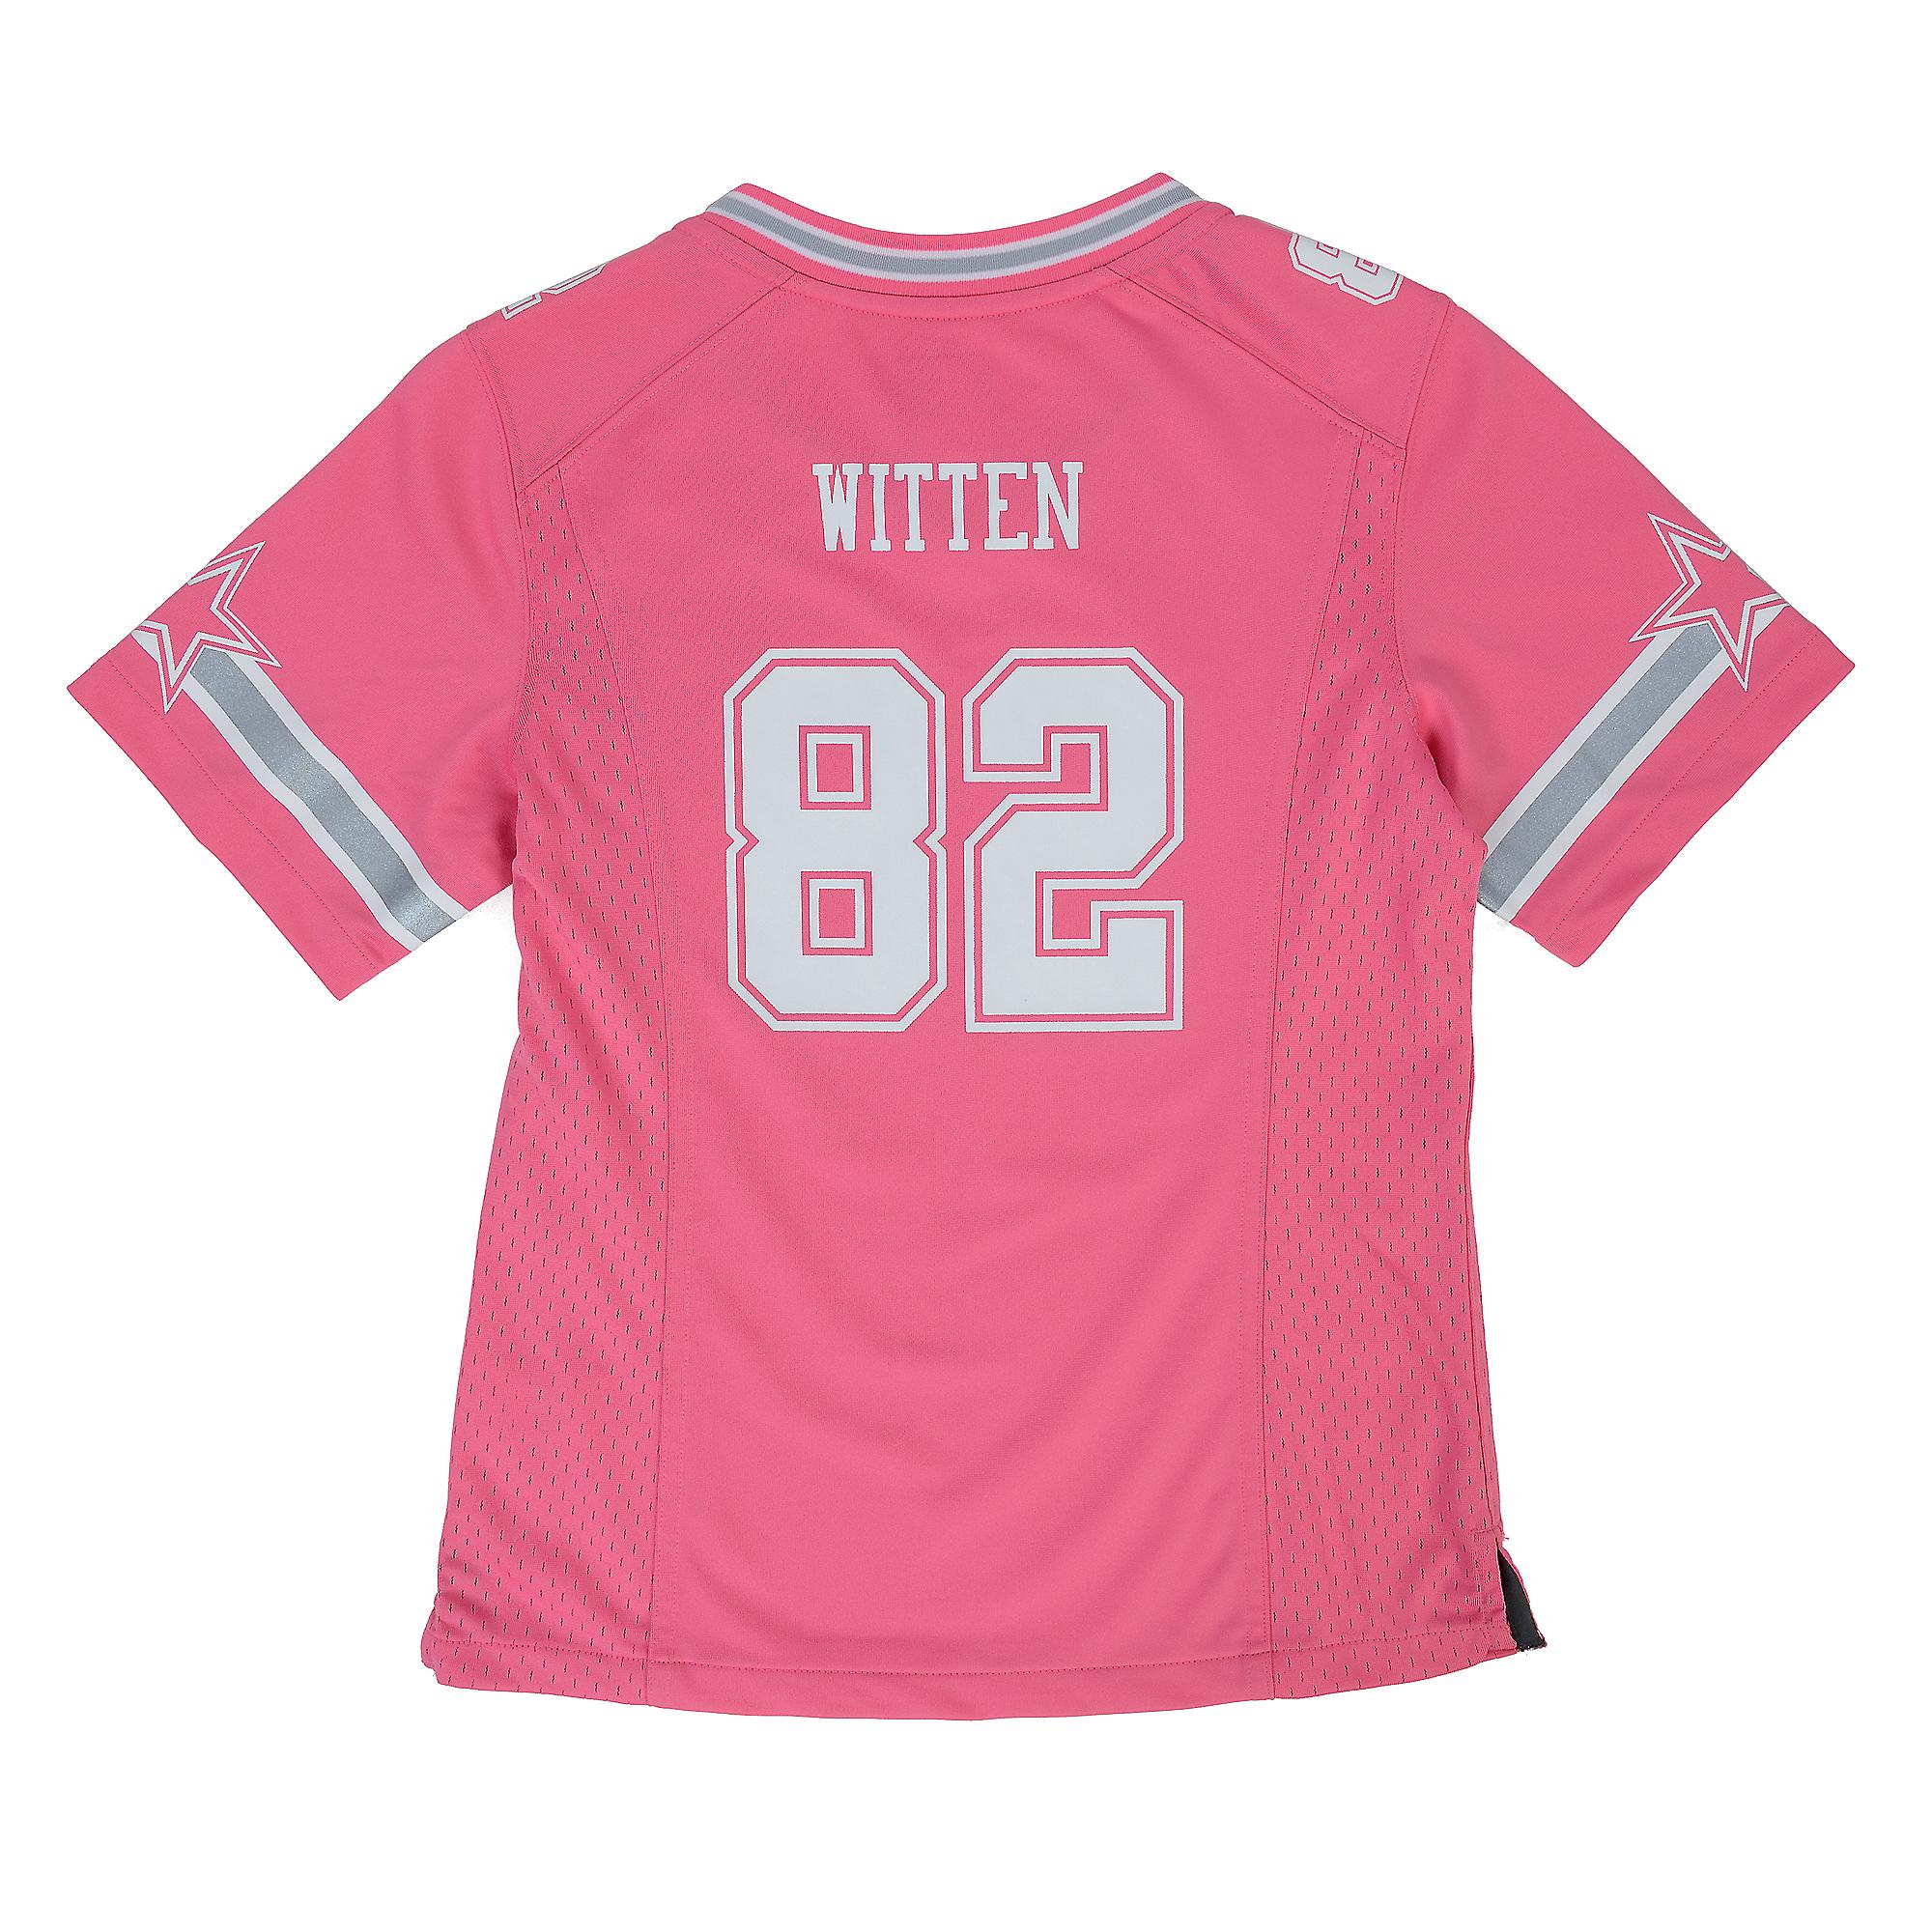 separation shoes b1b88 a1f21 Dallas Cowboys Girls Jason Witten #82 Pink Jersey | Dallas ...